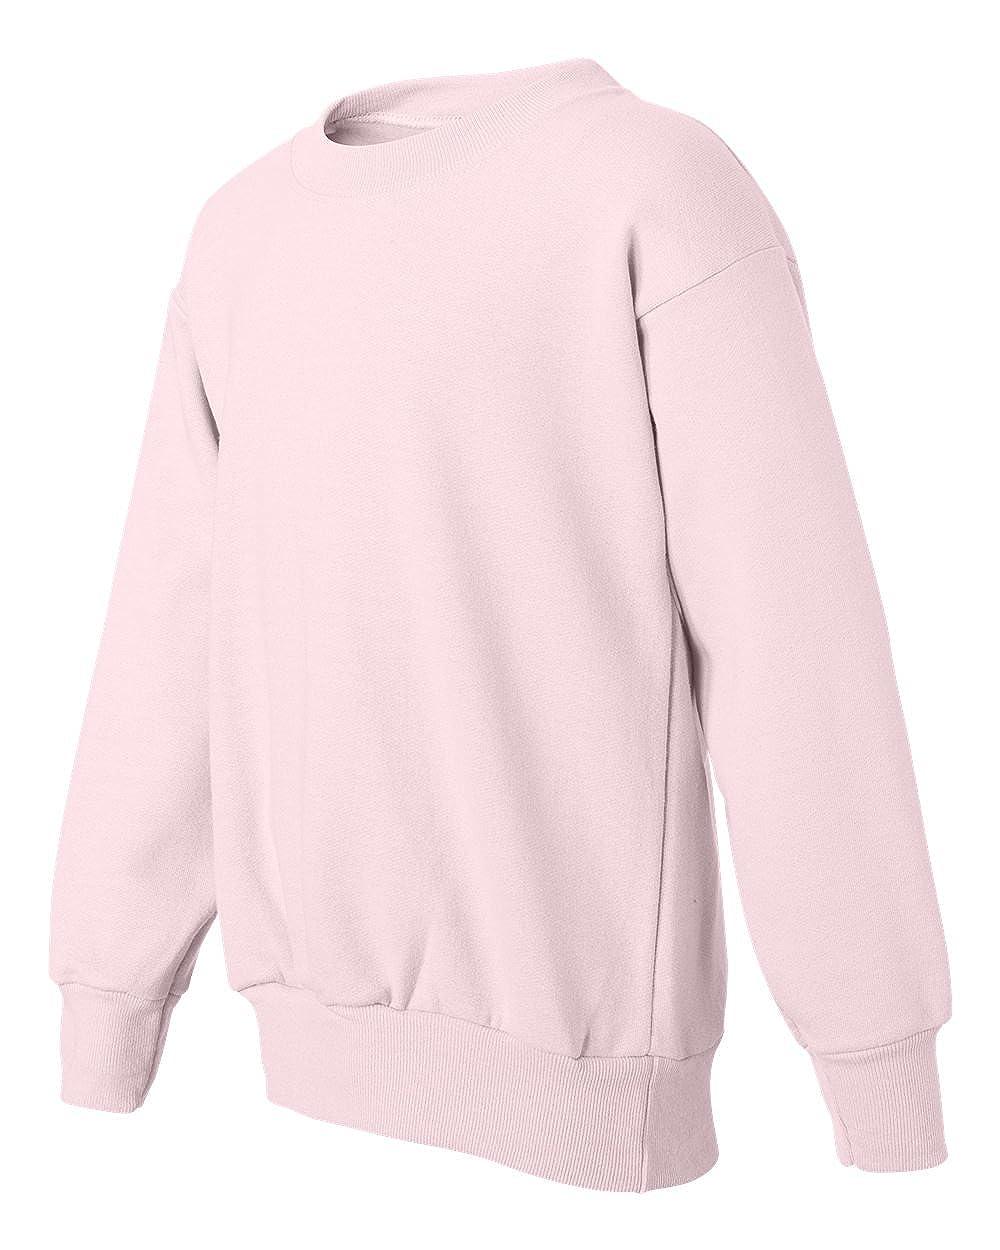 Hanes ComfortBlend Boys Crewneck Sweatshirt